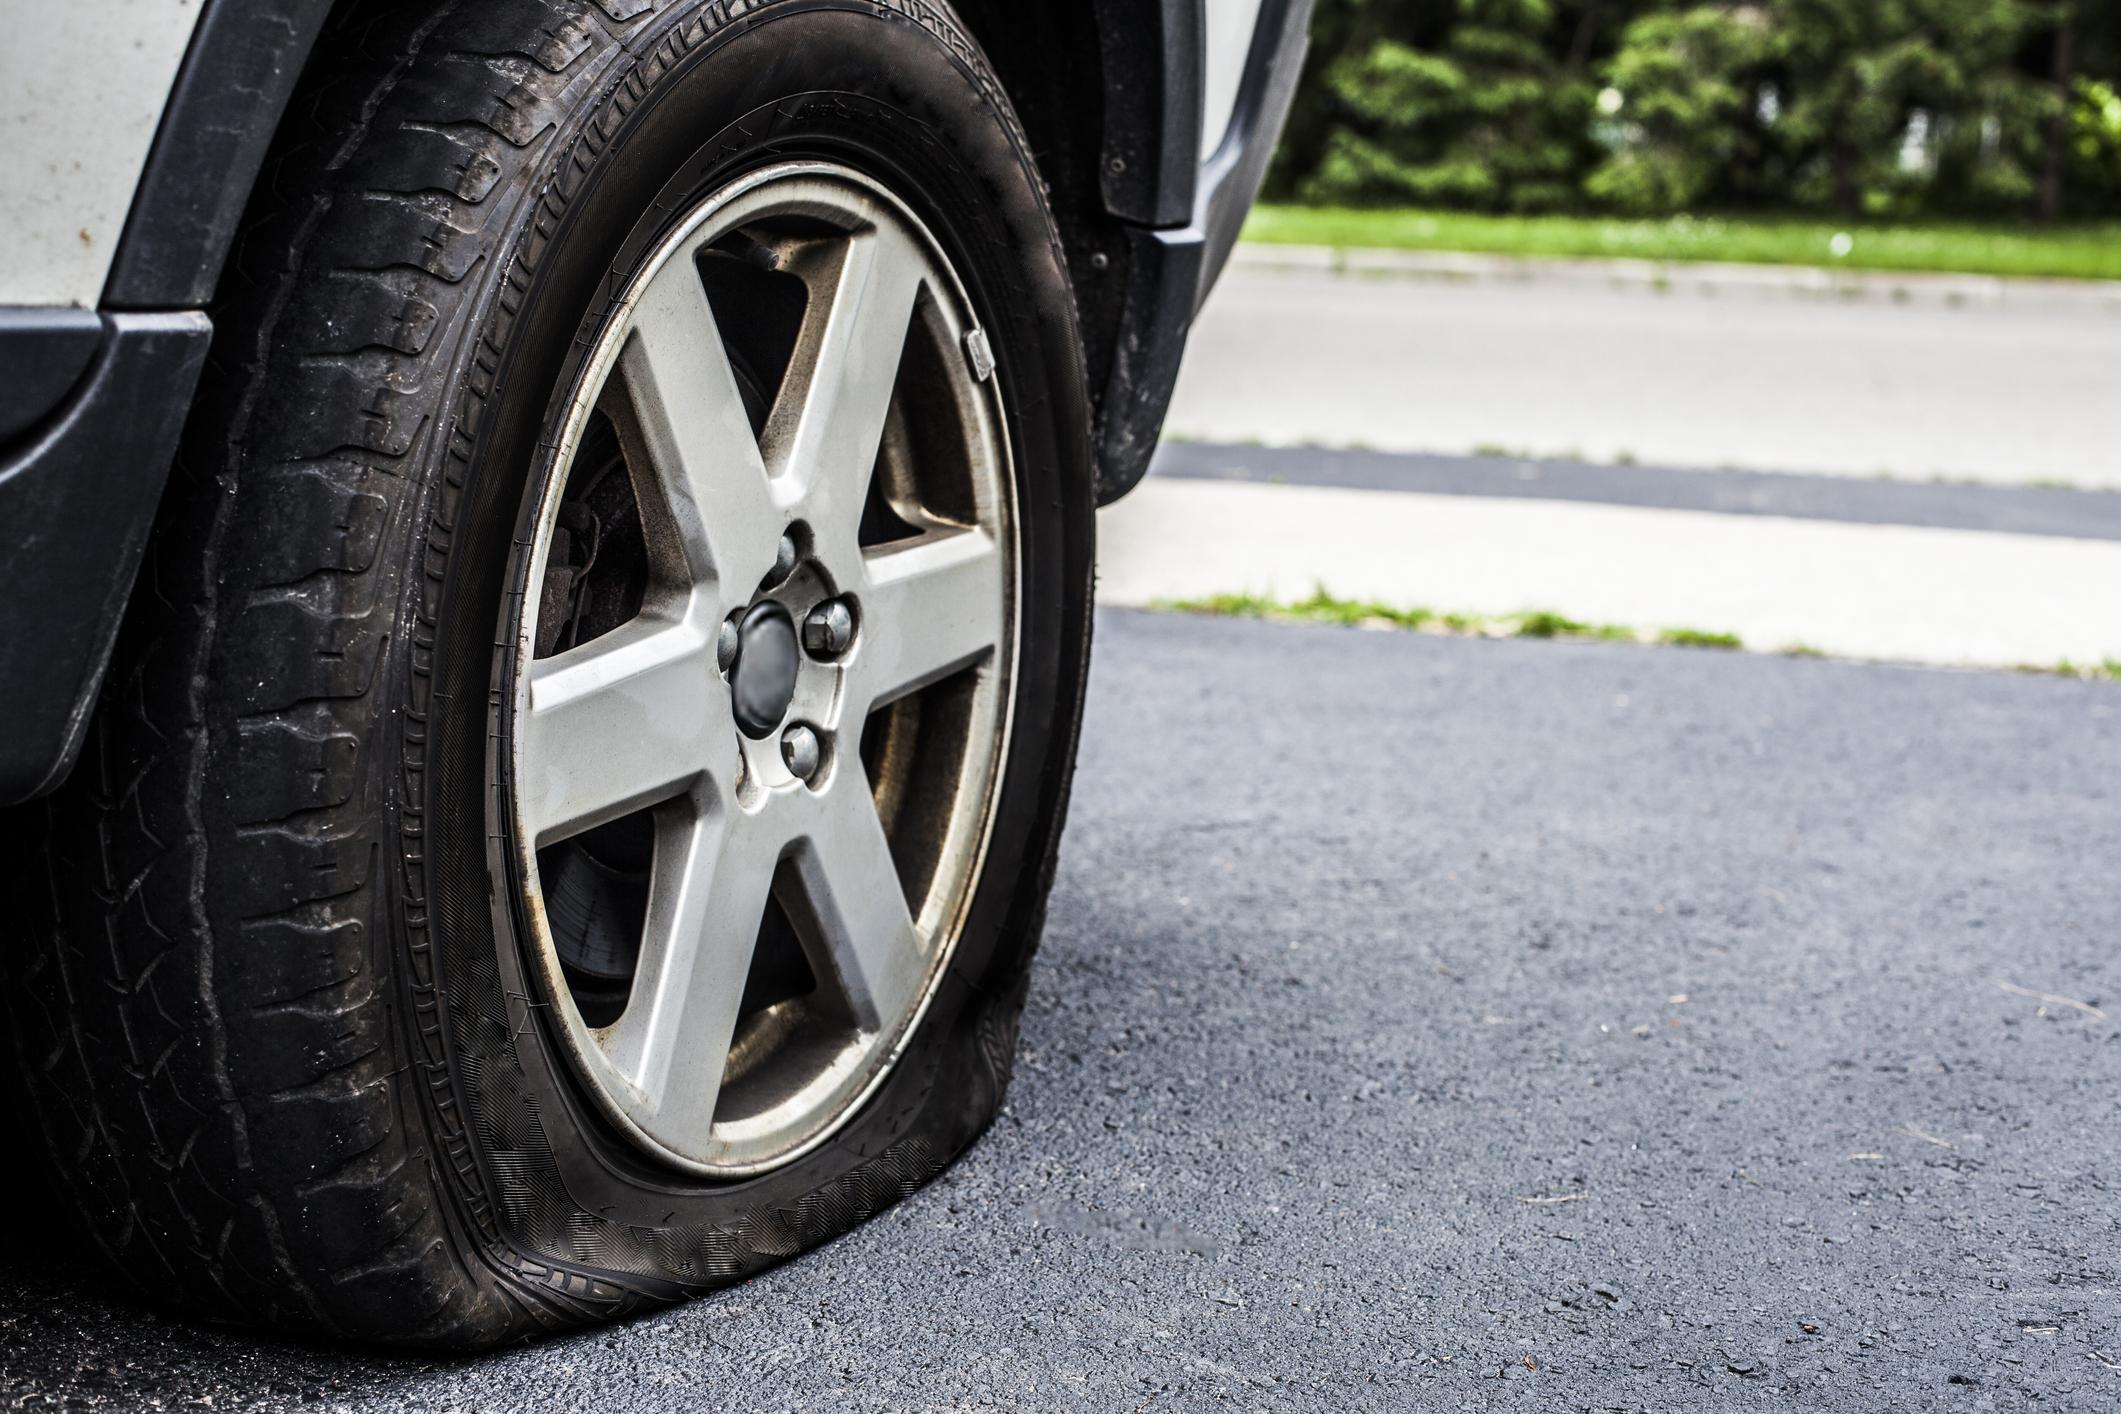 Sarah Taylor's Flat Tire Angel